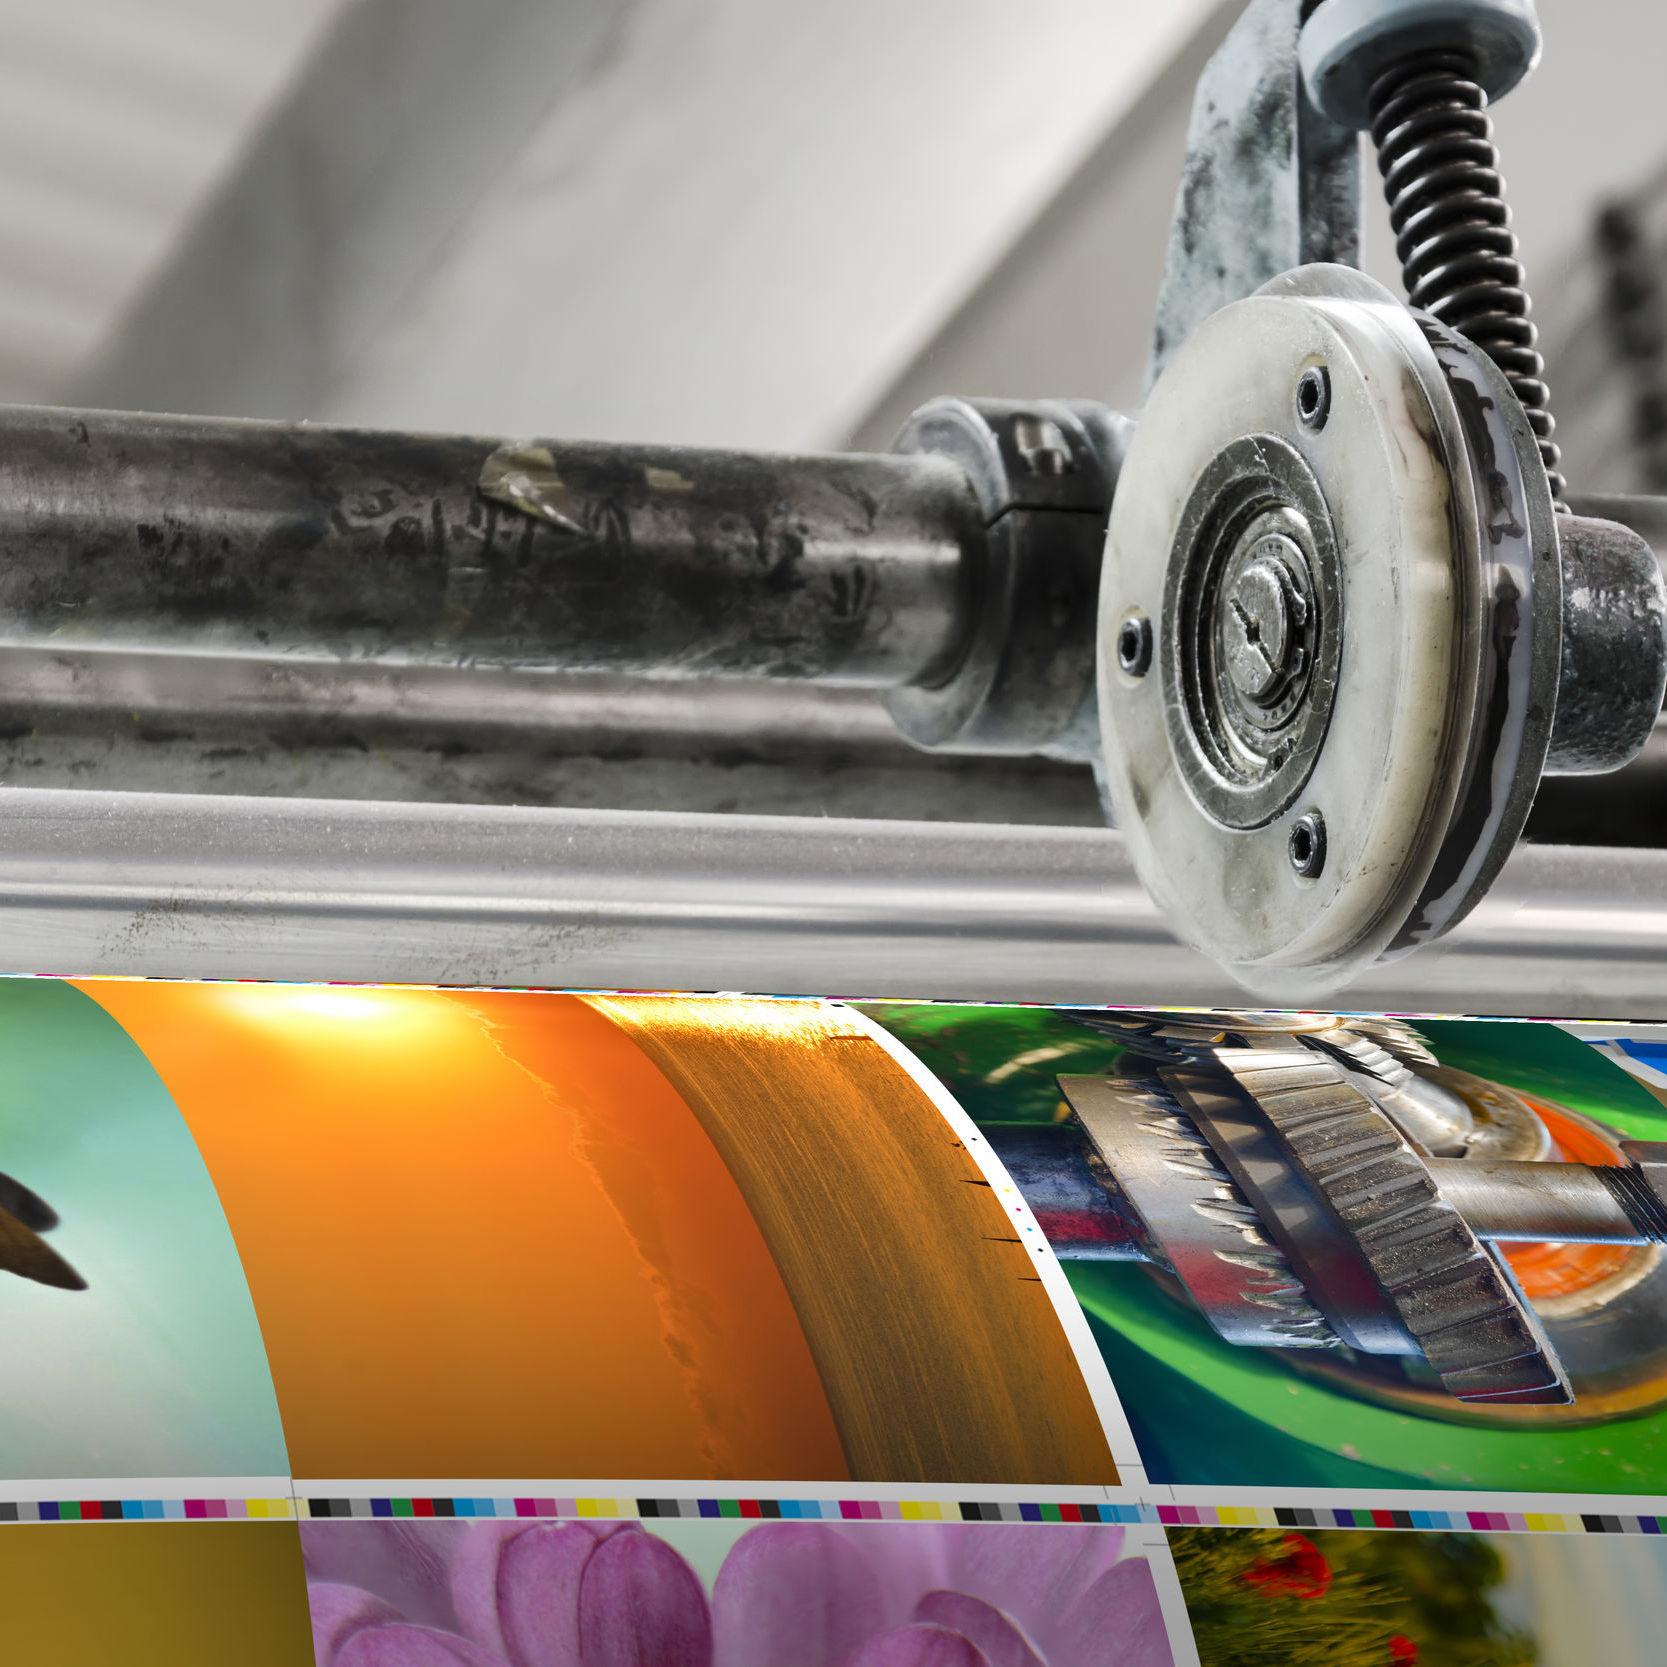 38588163 - magazine offset printing machine close up